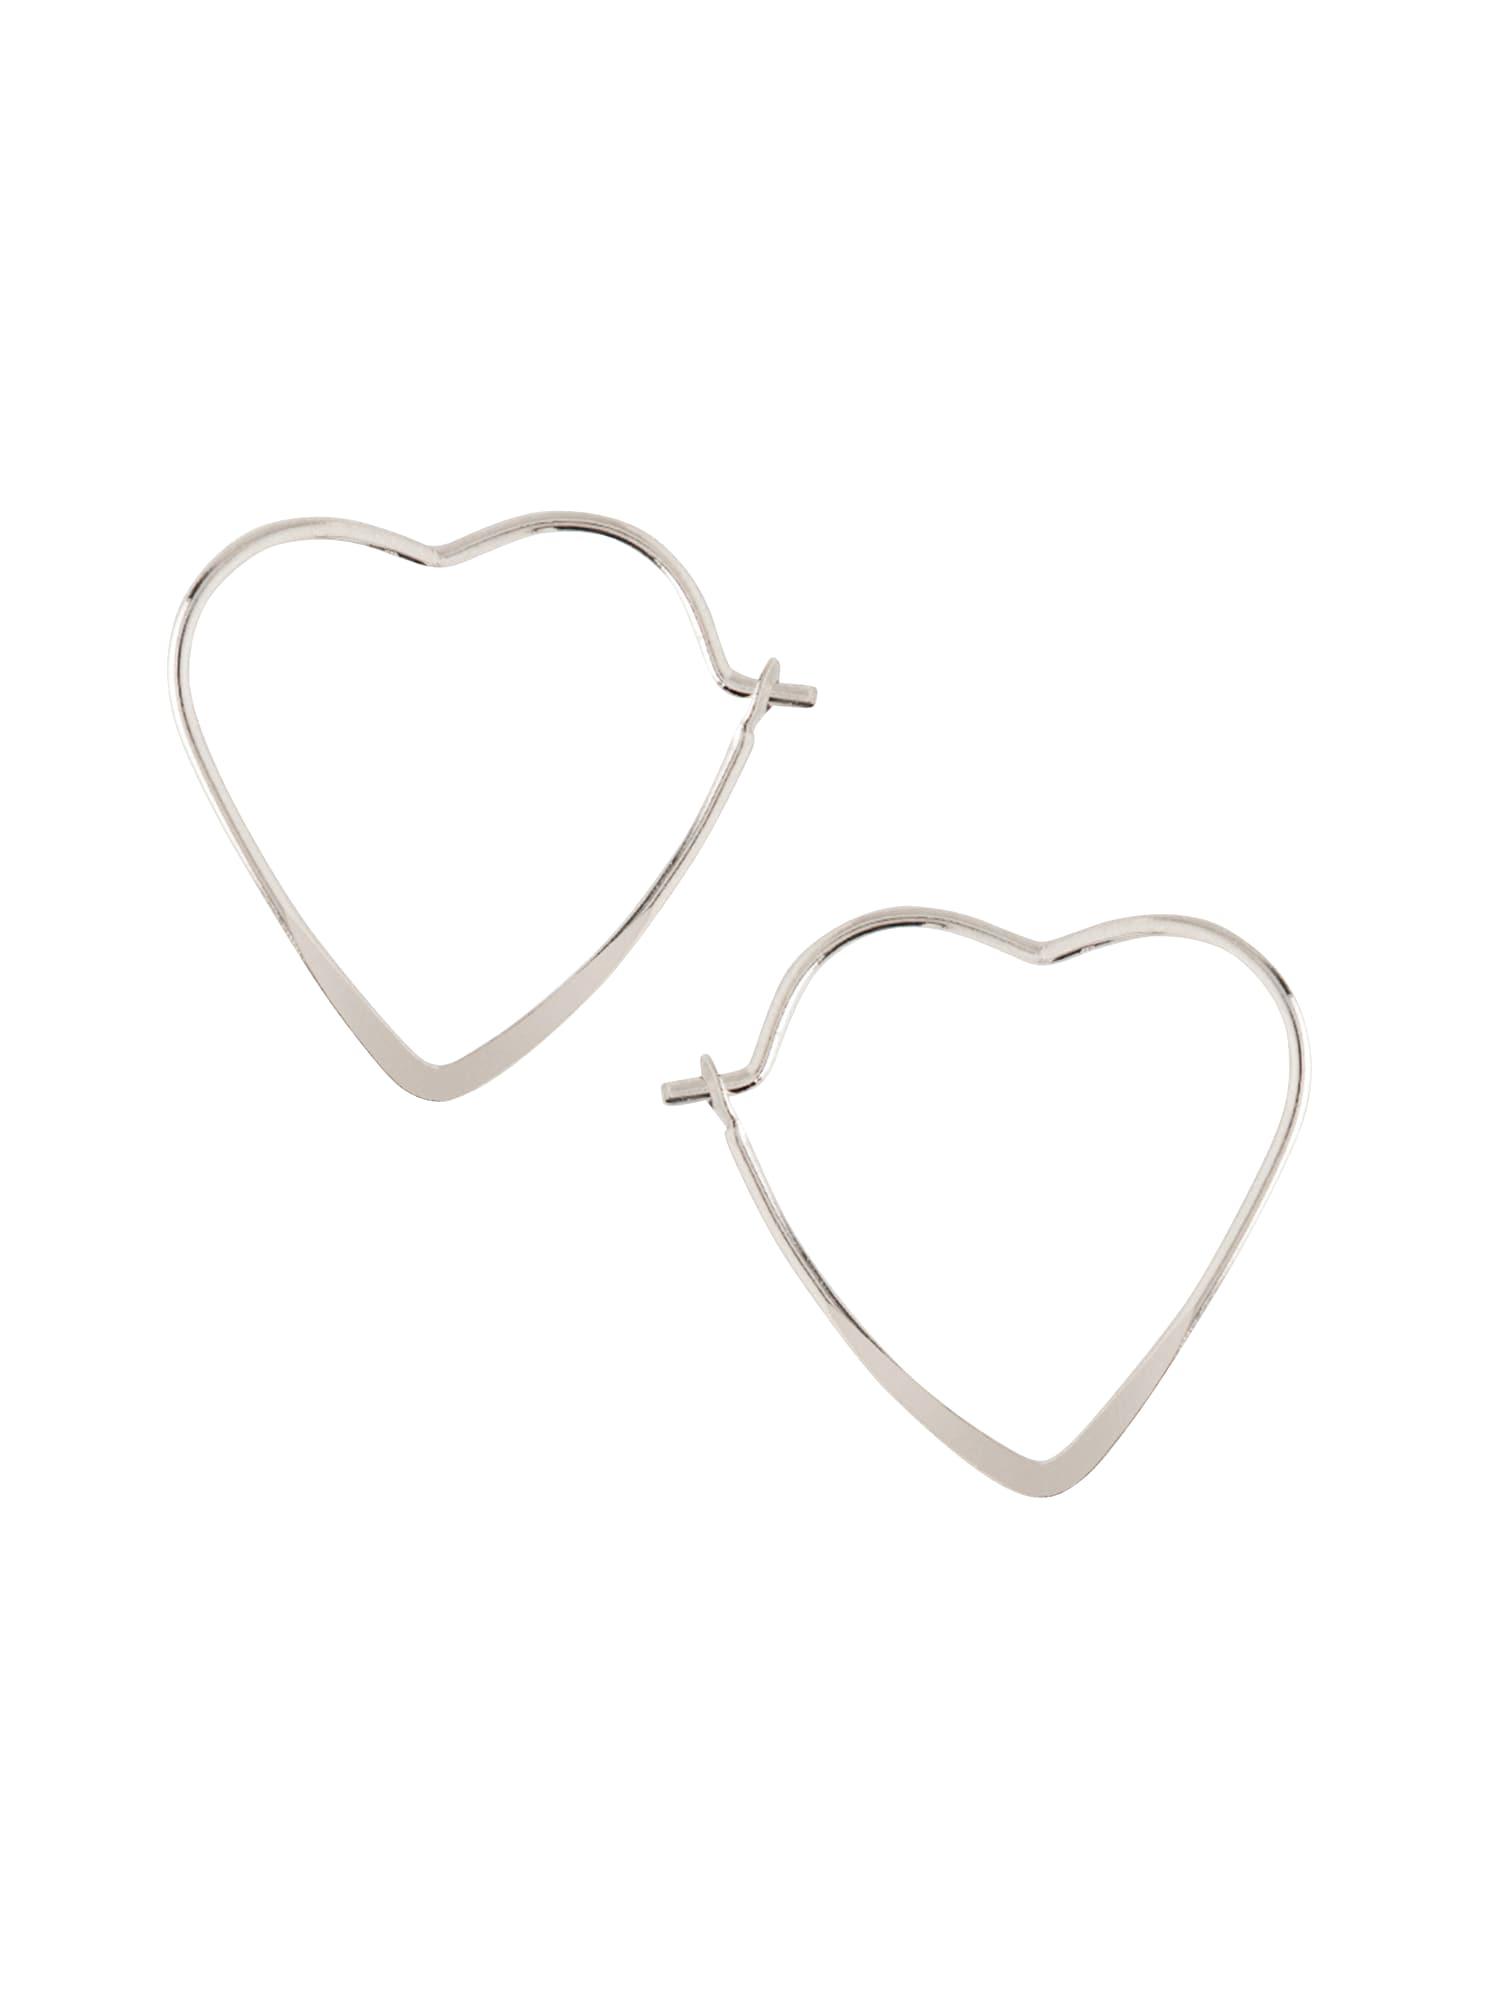 Náušnice small heart hoop stříbrná Orelia